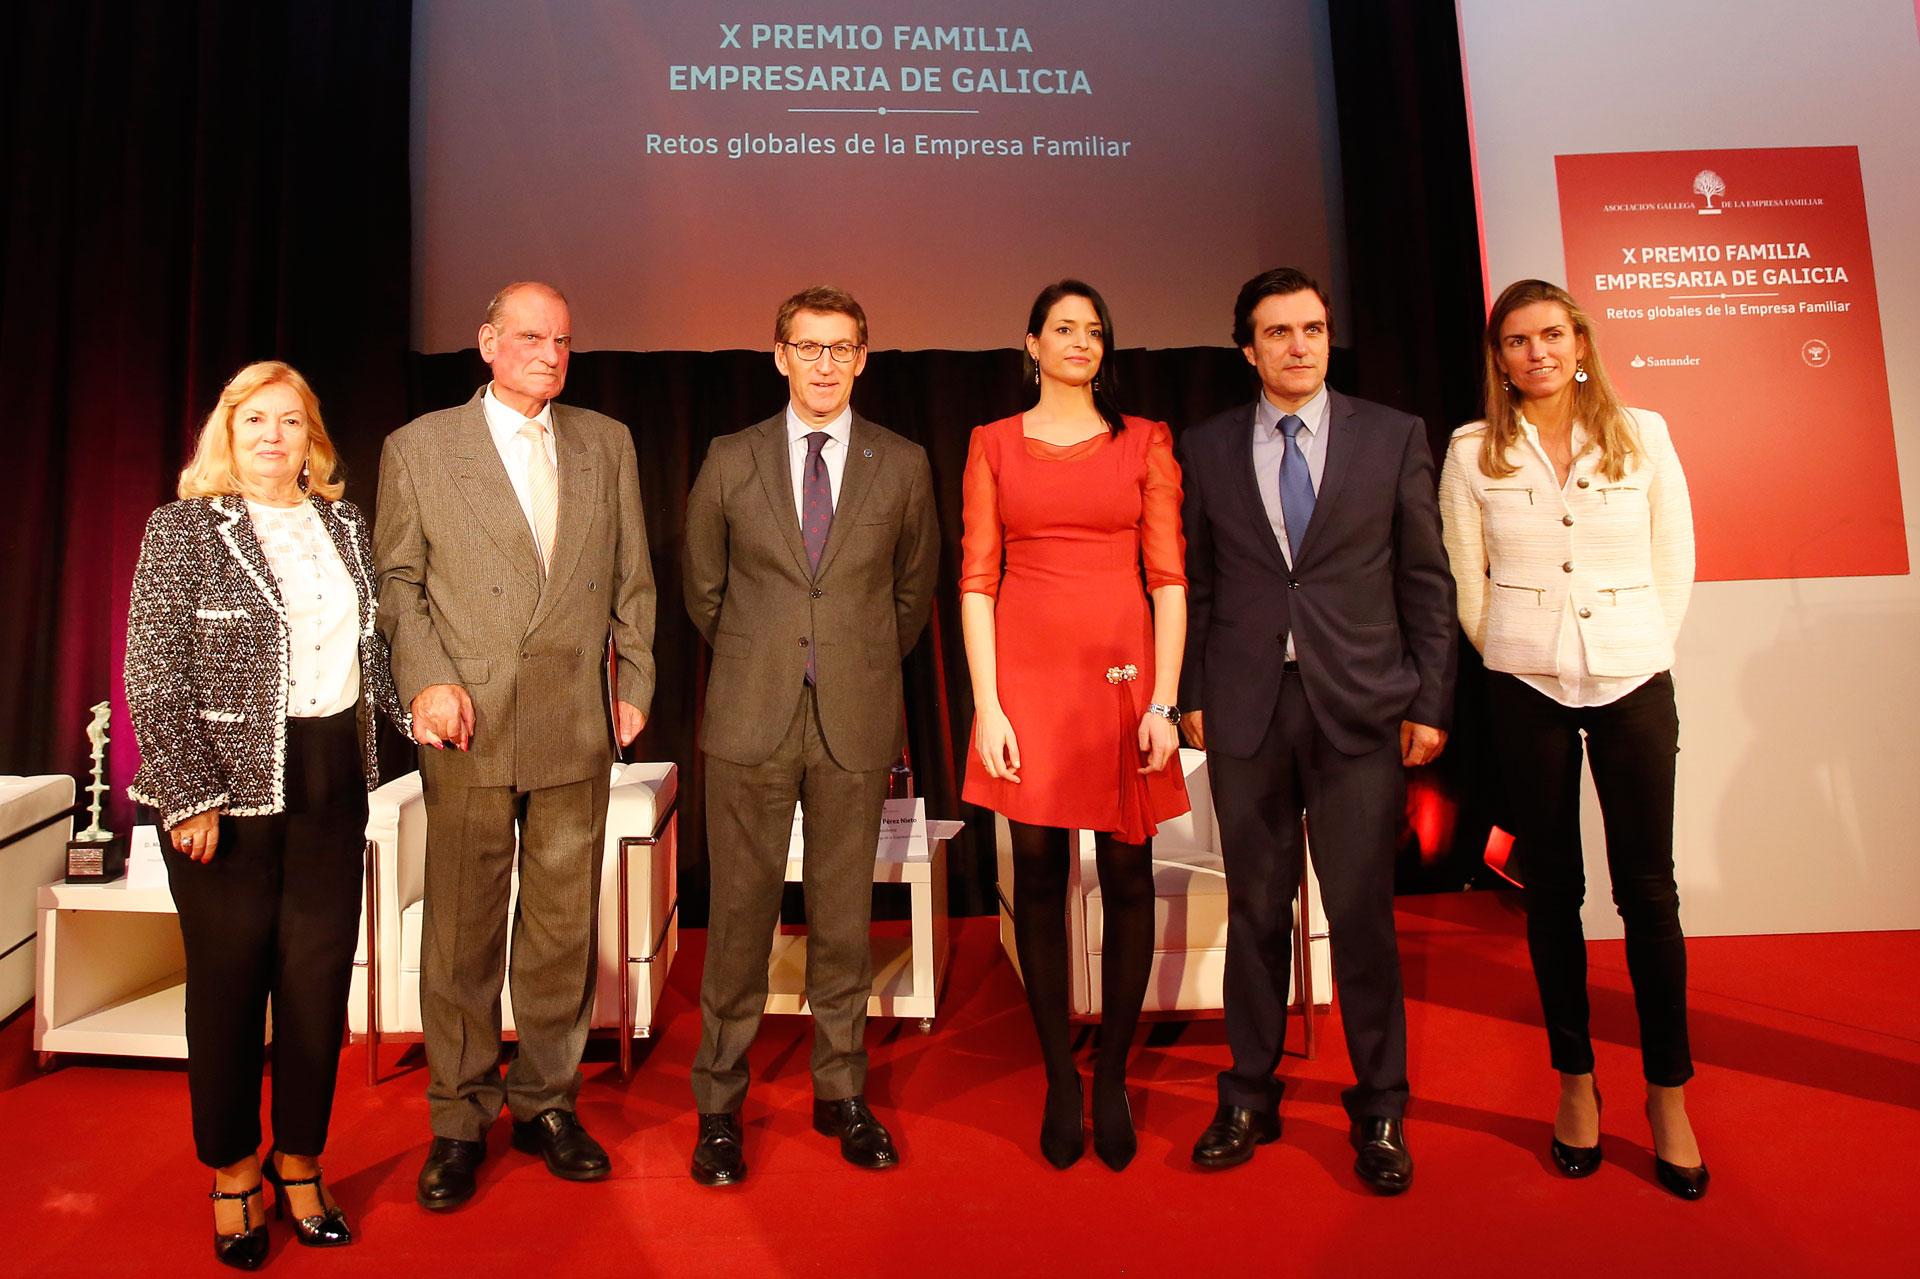 Familia Froiz (Grupo Froiz), X Premio Familia Empresaria